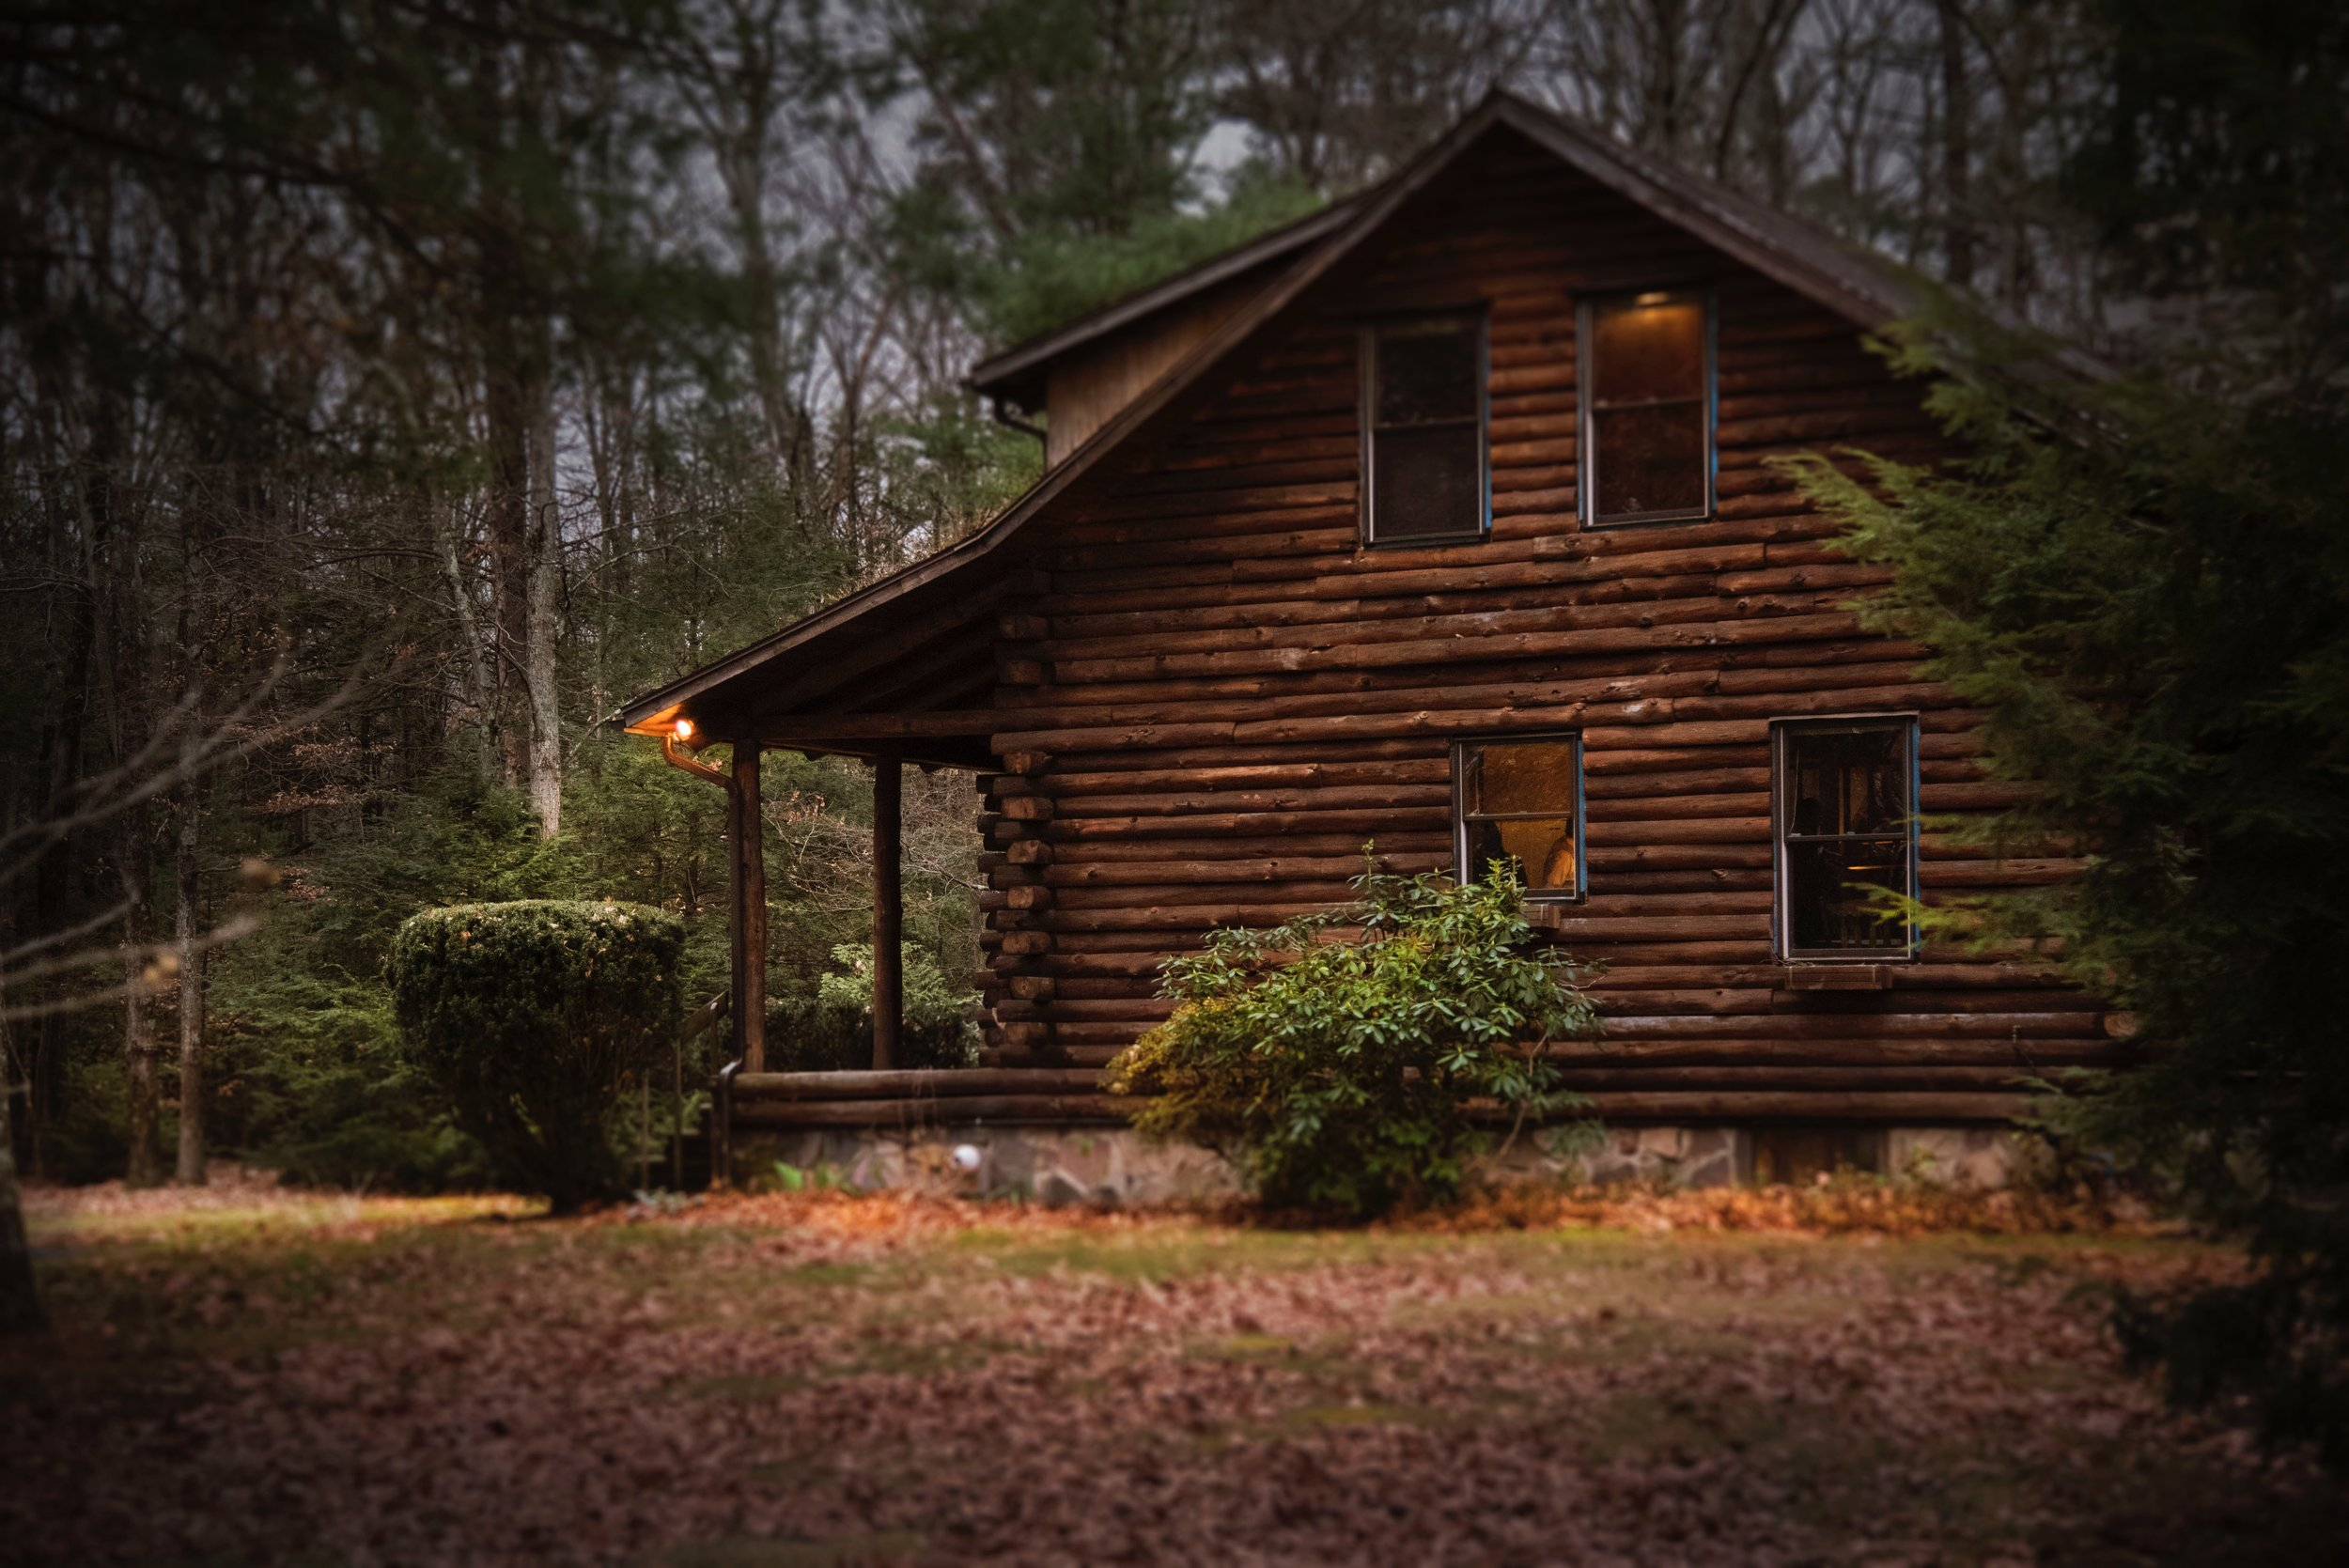 architecture-barn-building-803975.jpg